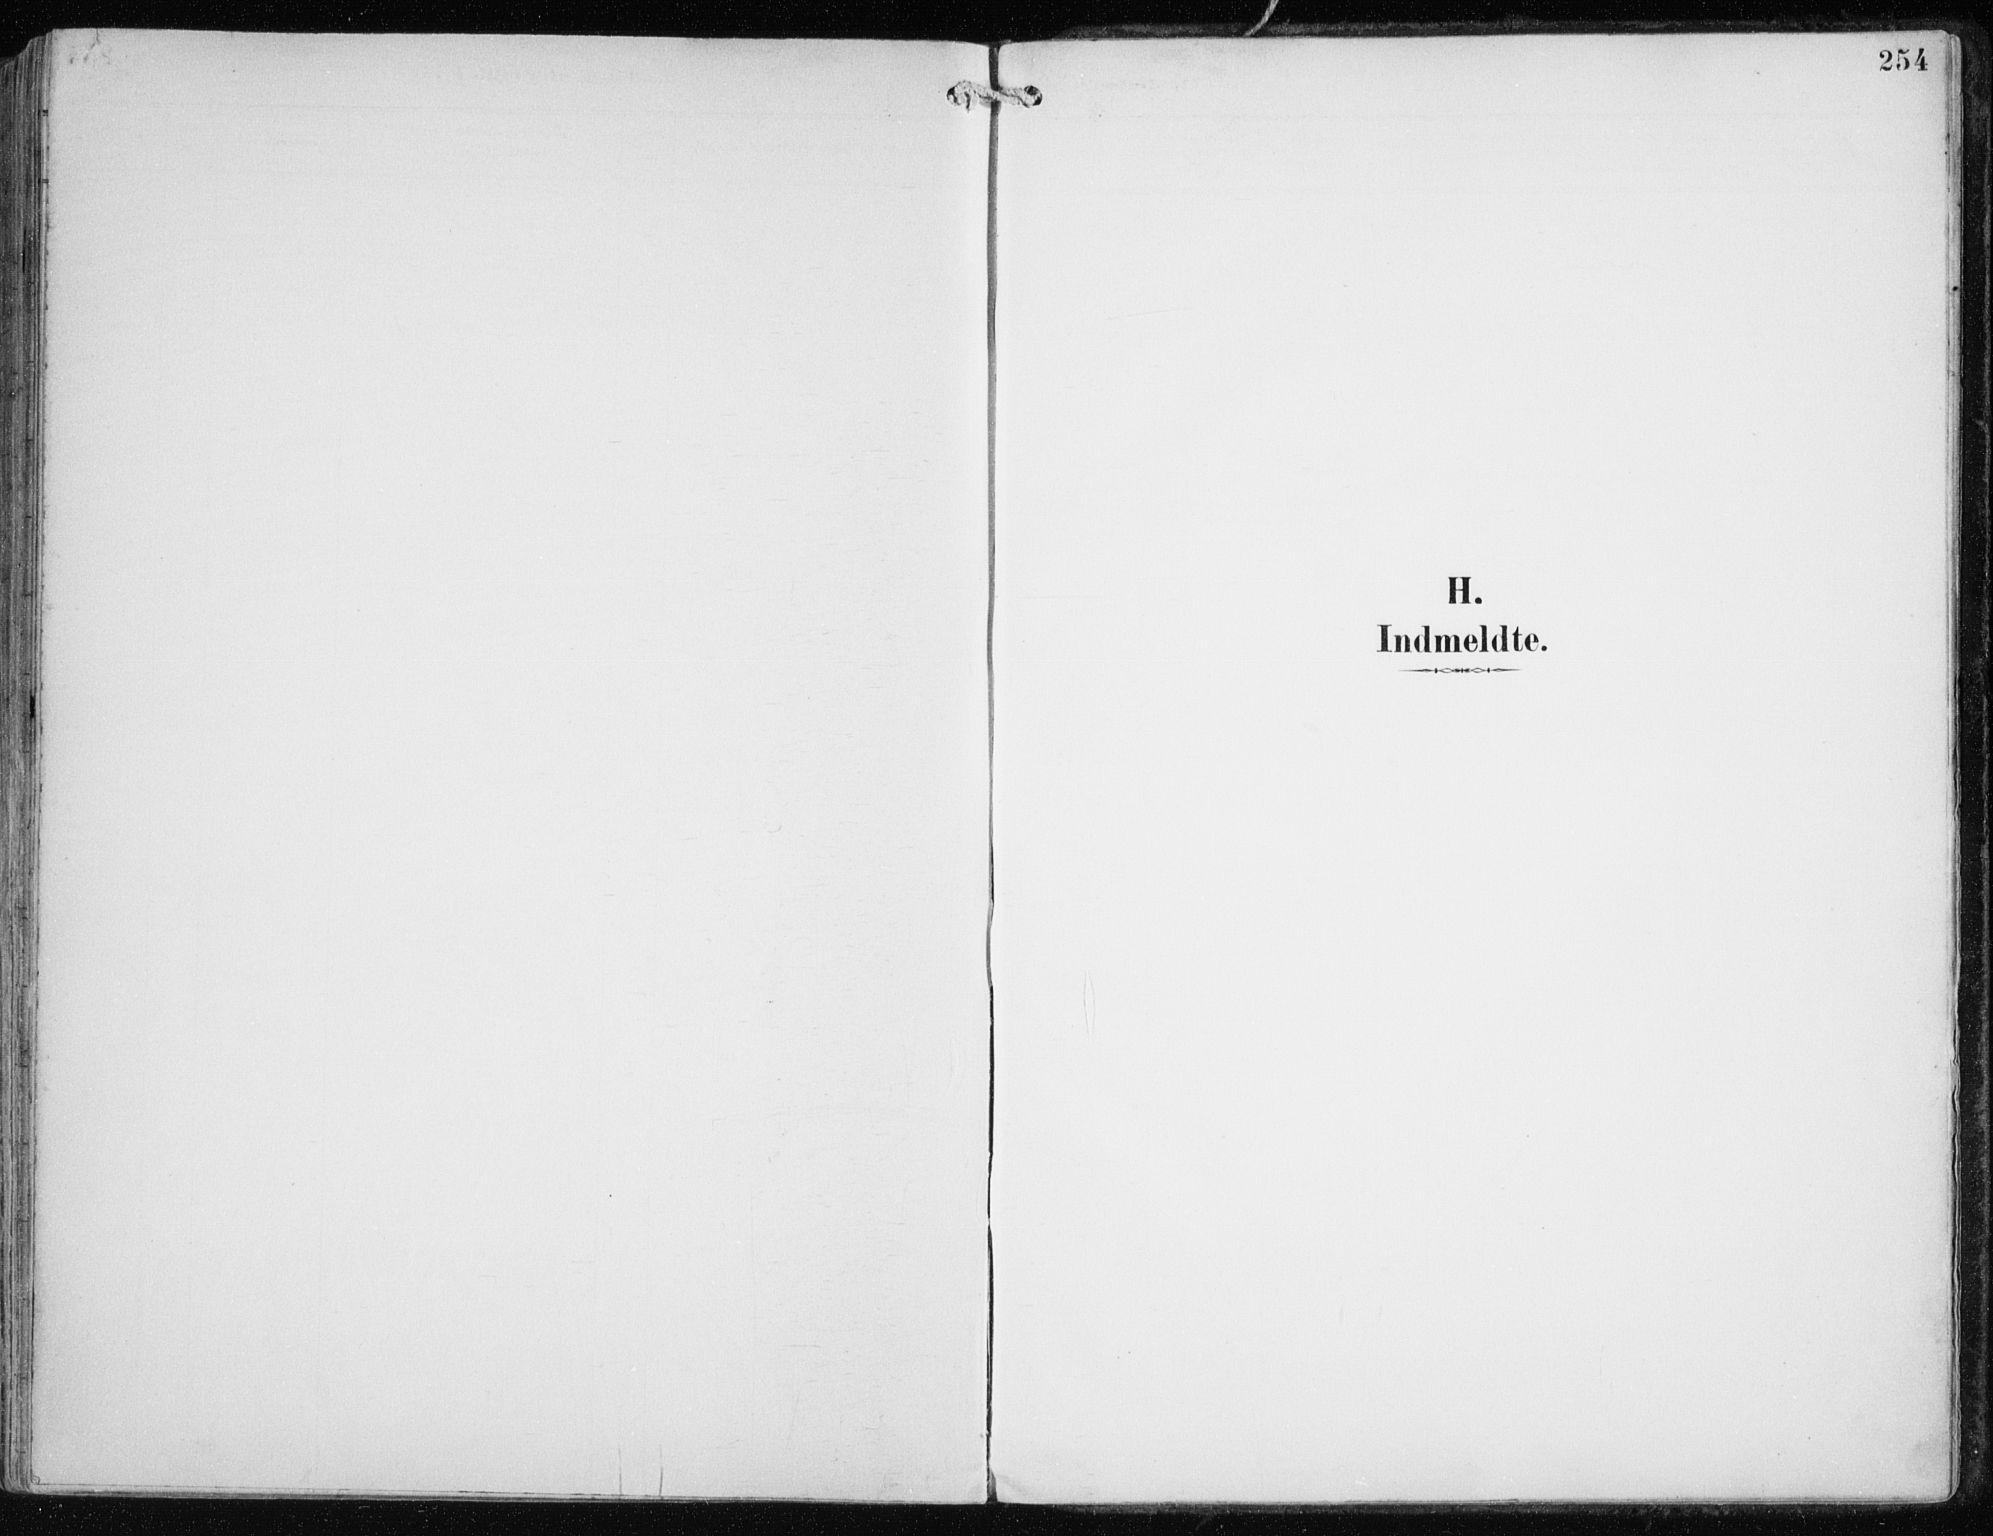 SATØ, Skjervøy sokneprestkontor, H/Ha/Haa/L0016kirke: Ministerialbok nr. 16, 1892-1908, s. 254